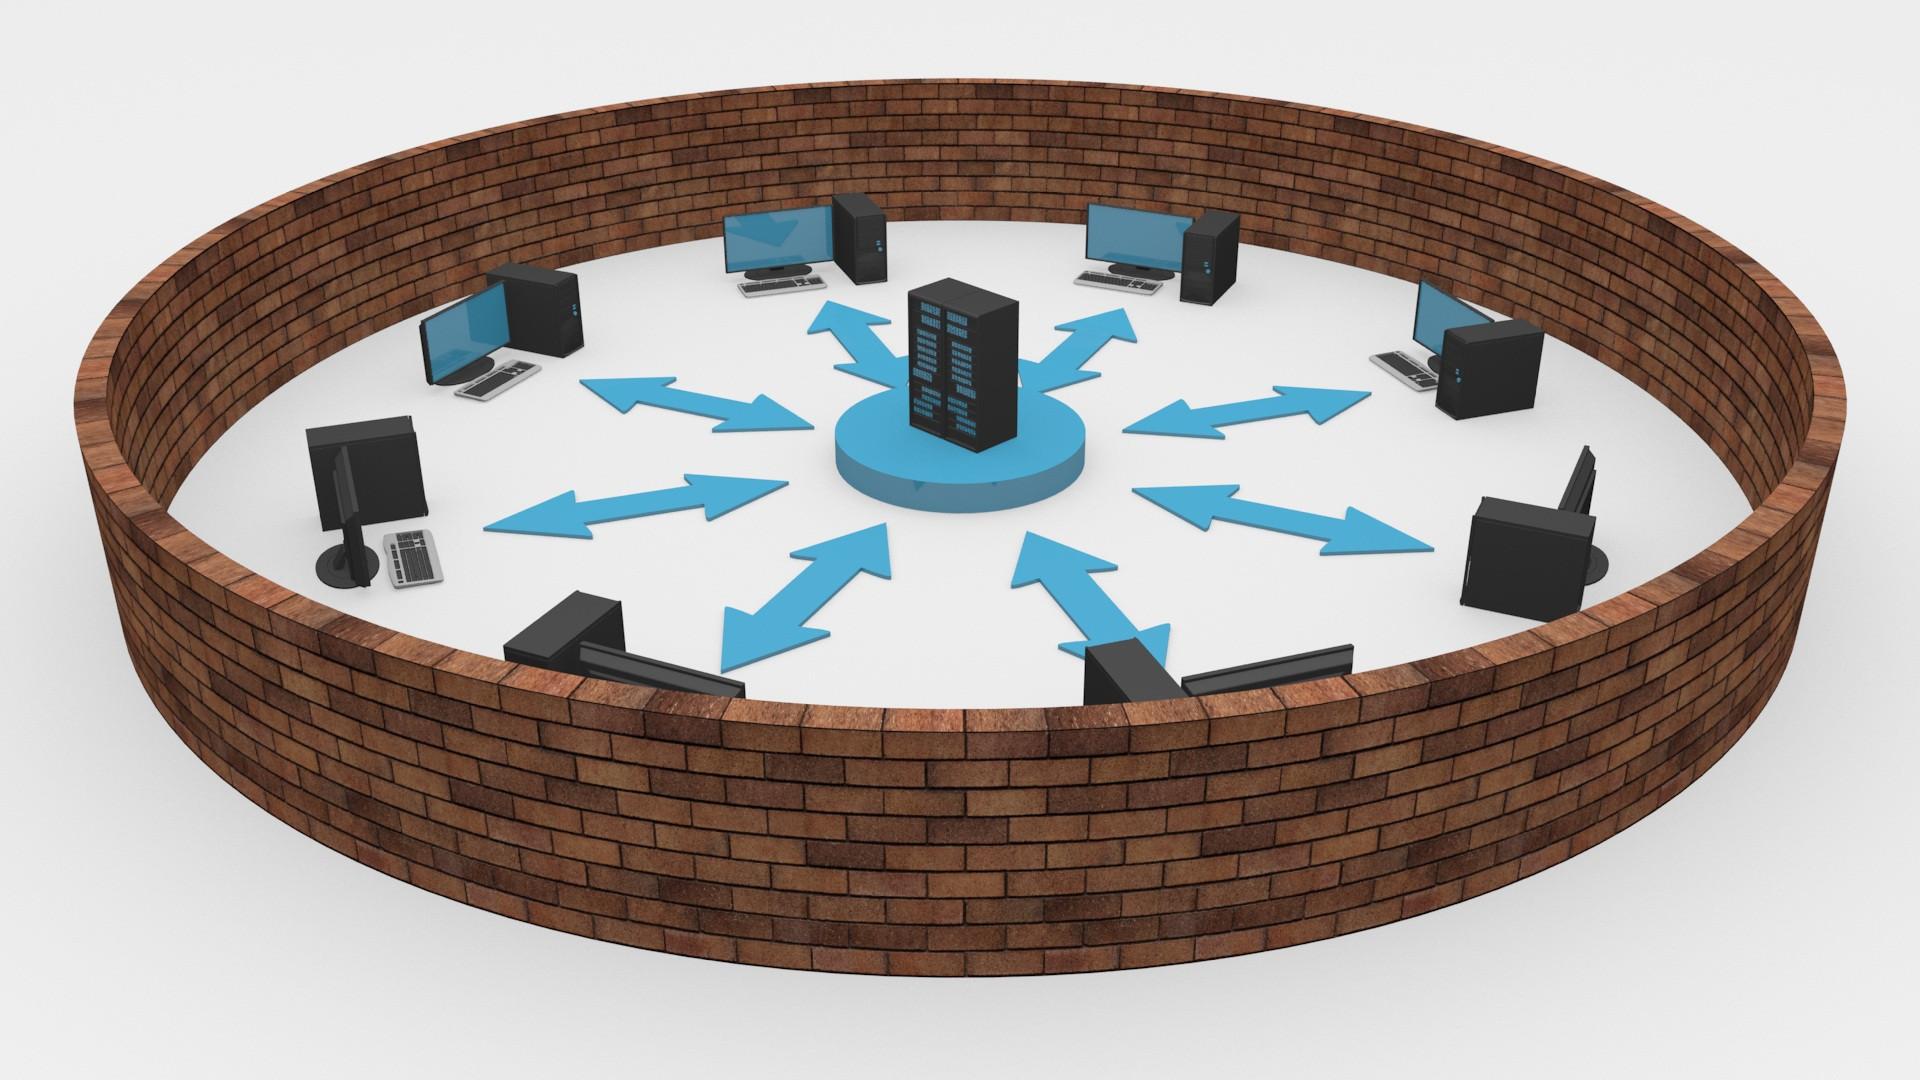 cortafuegos-firewall-seguridad-computador